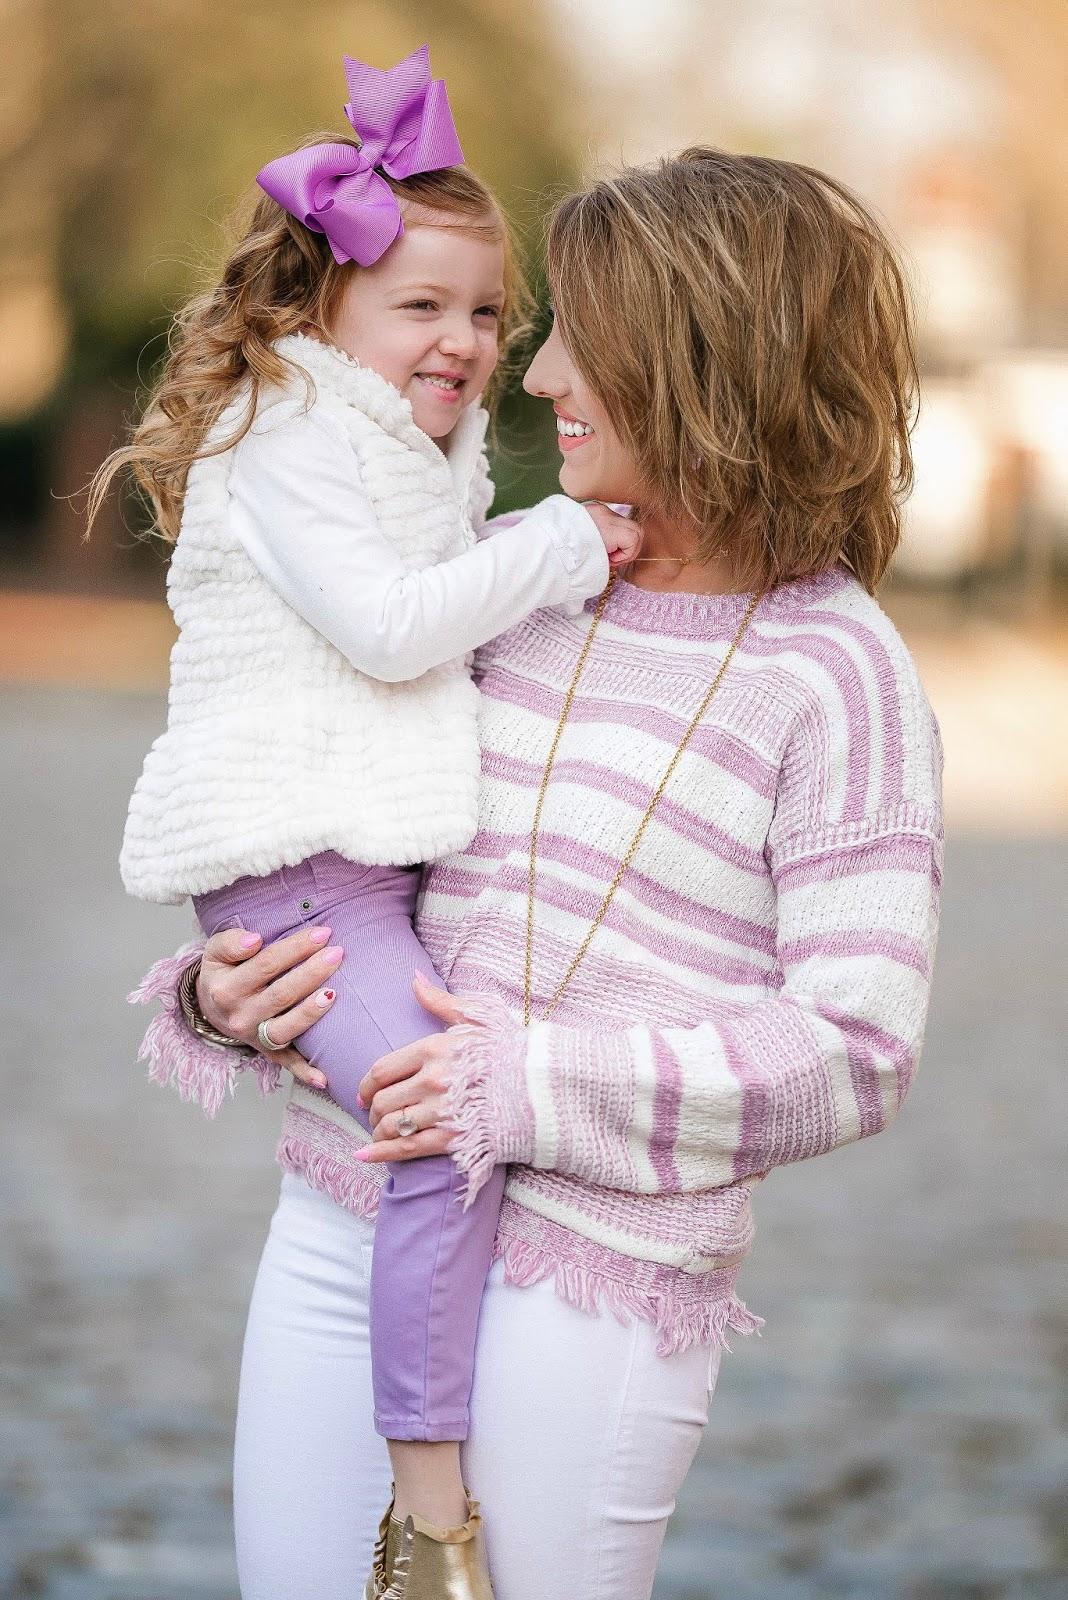 Lavender Love: Mommy & Me Pre-Spring Look - Something Delightful Blog